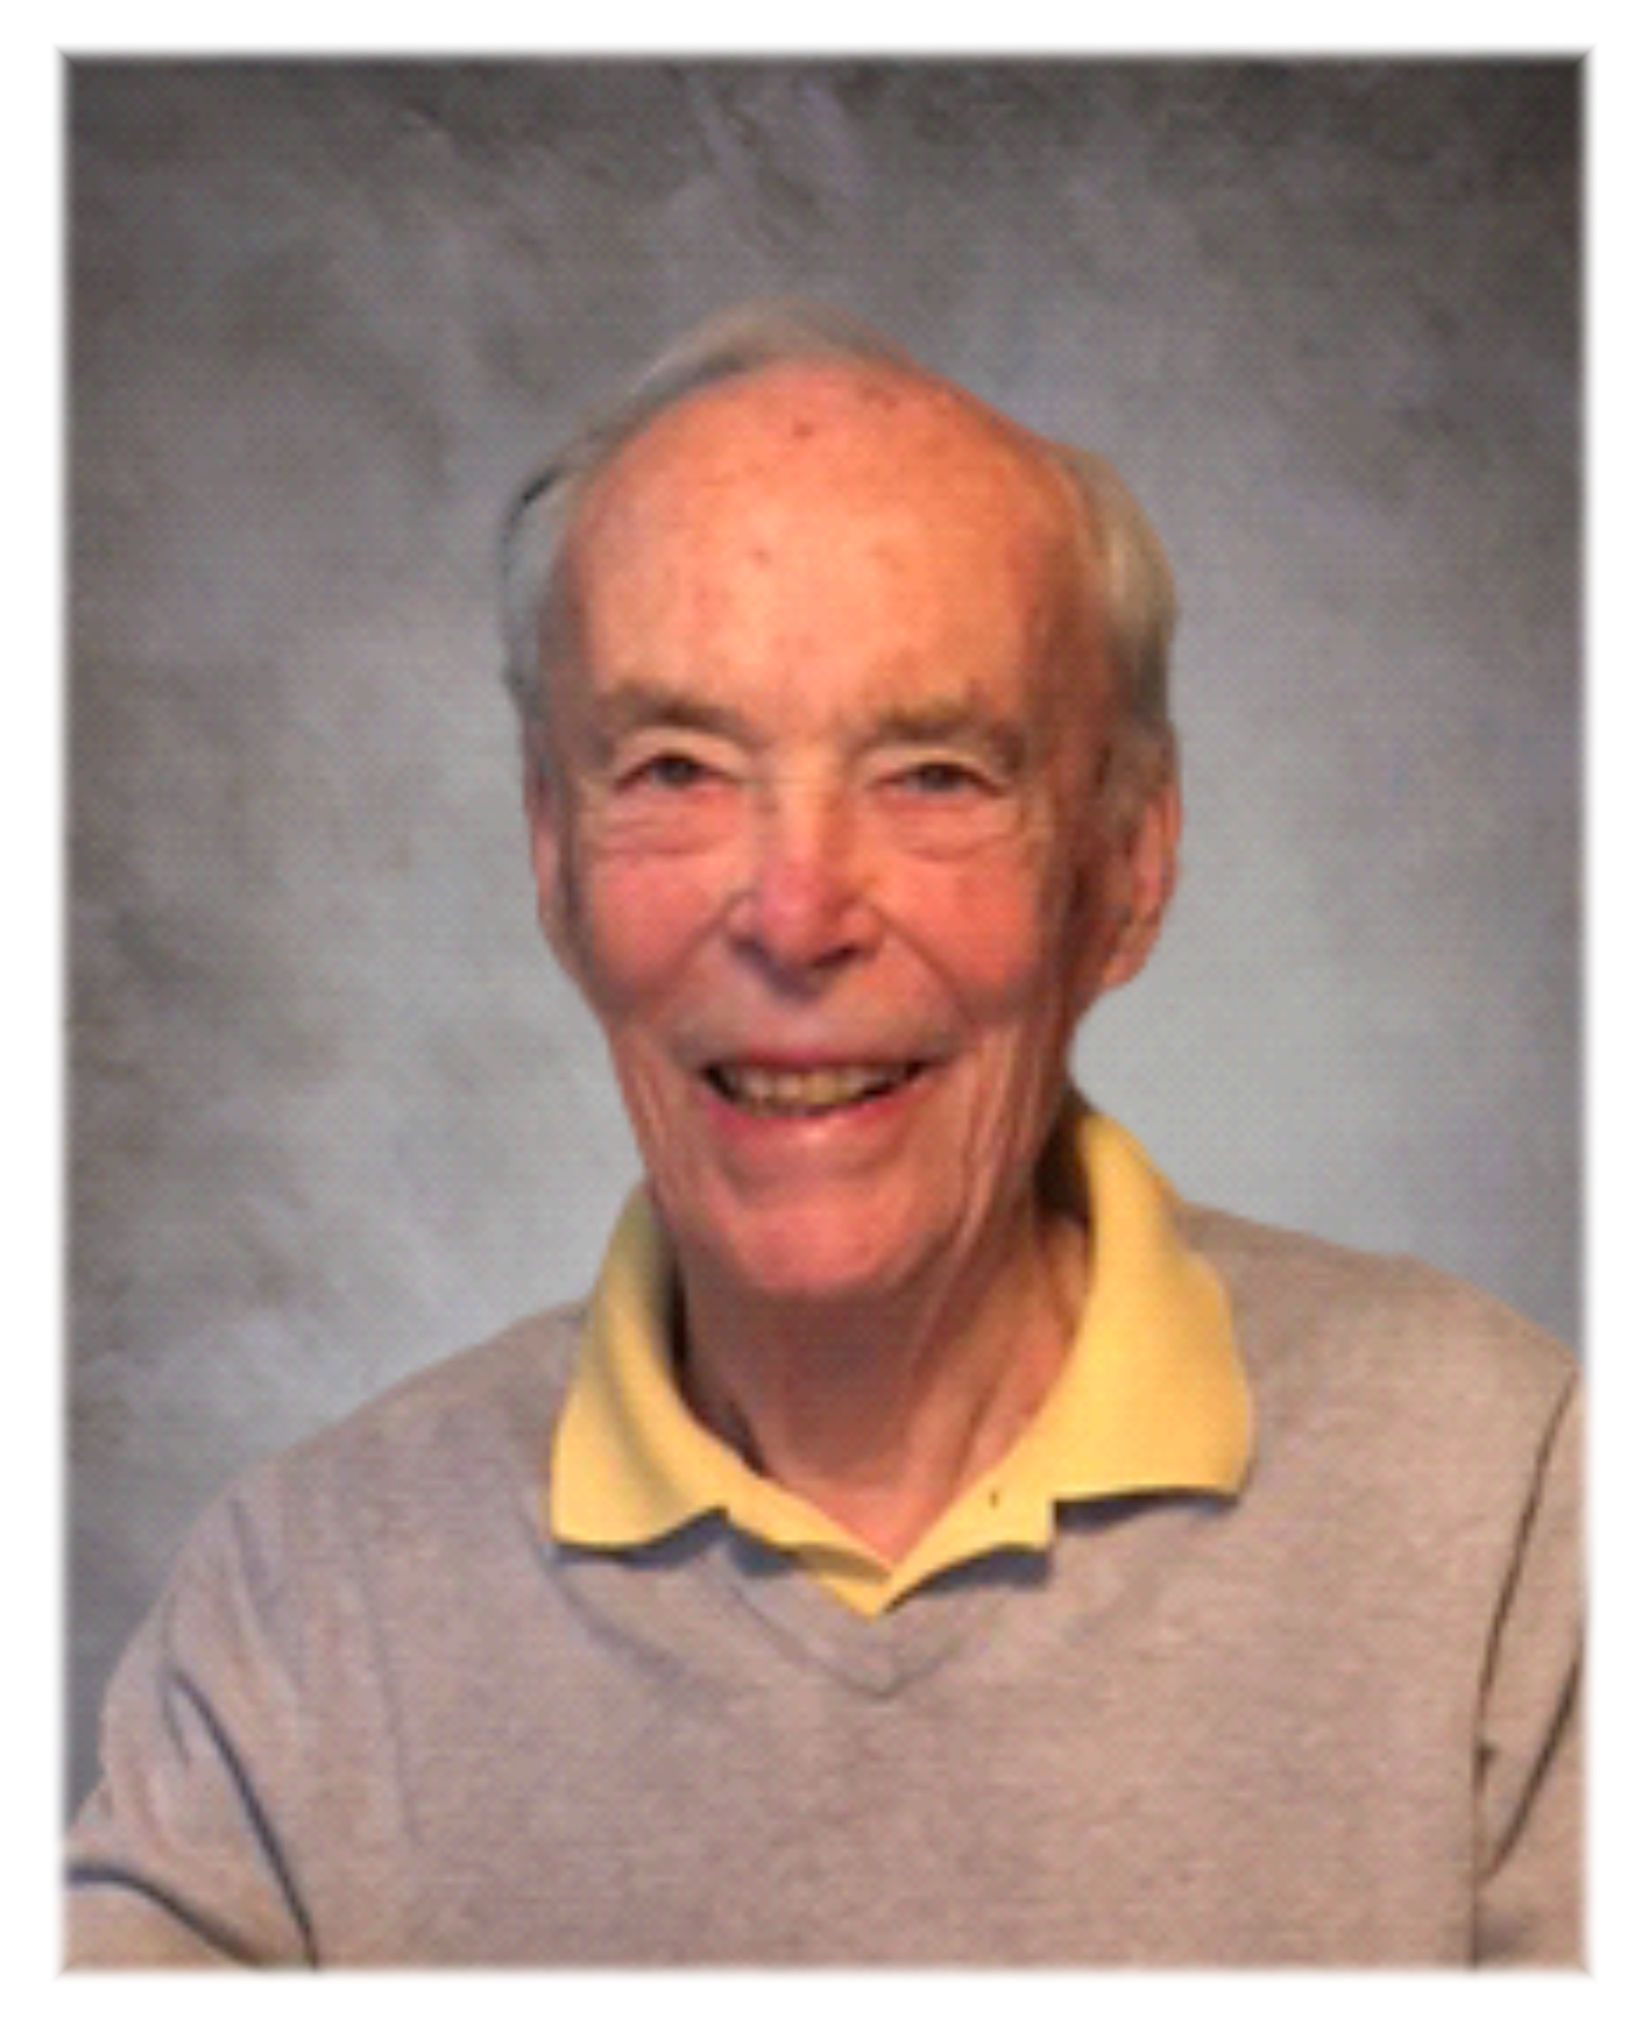 Derek M. Jamieson